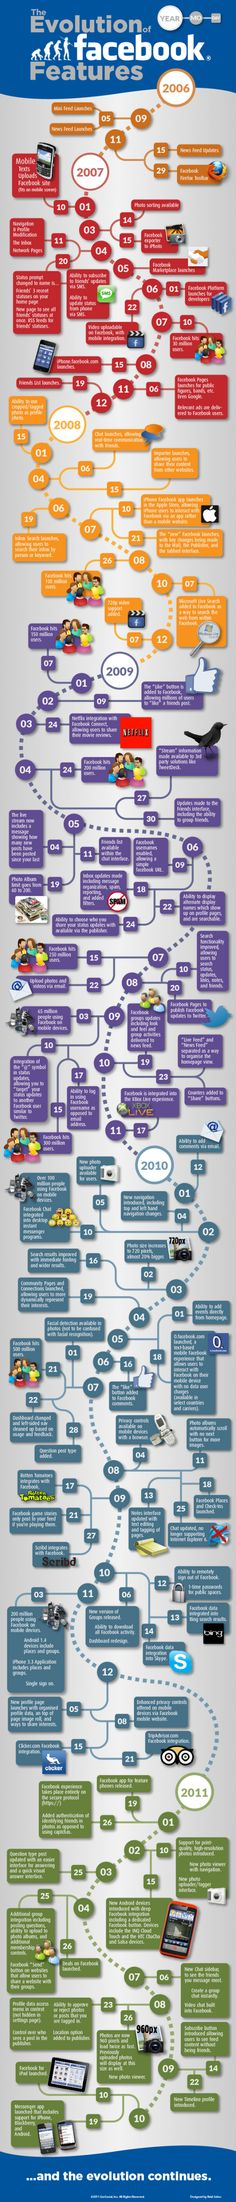 #Facebook evolutie sinds 2006 (via @TheJaneway)